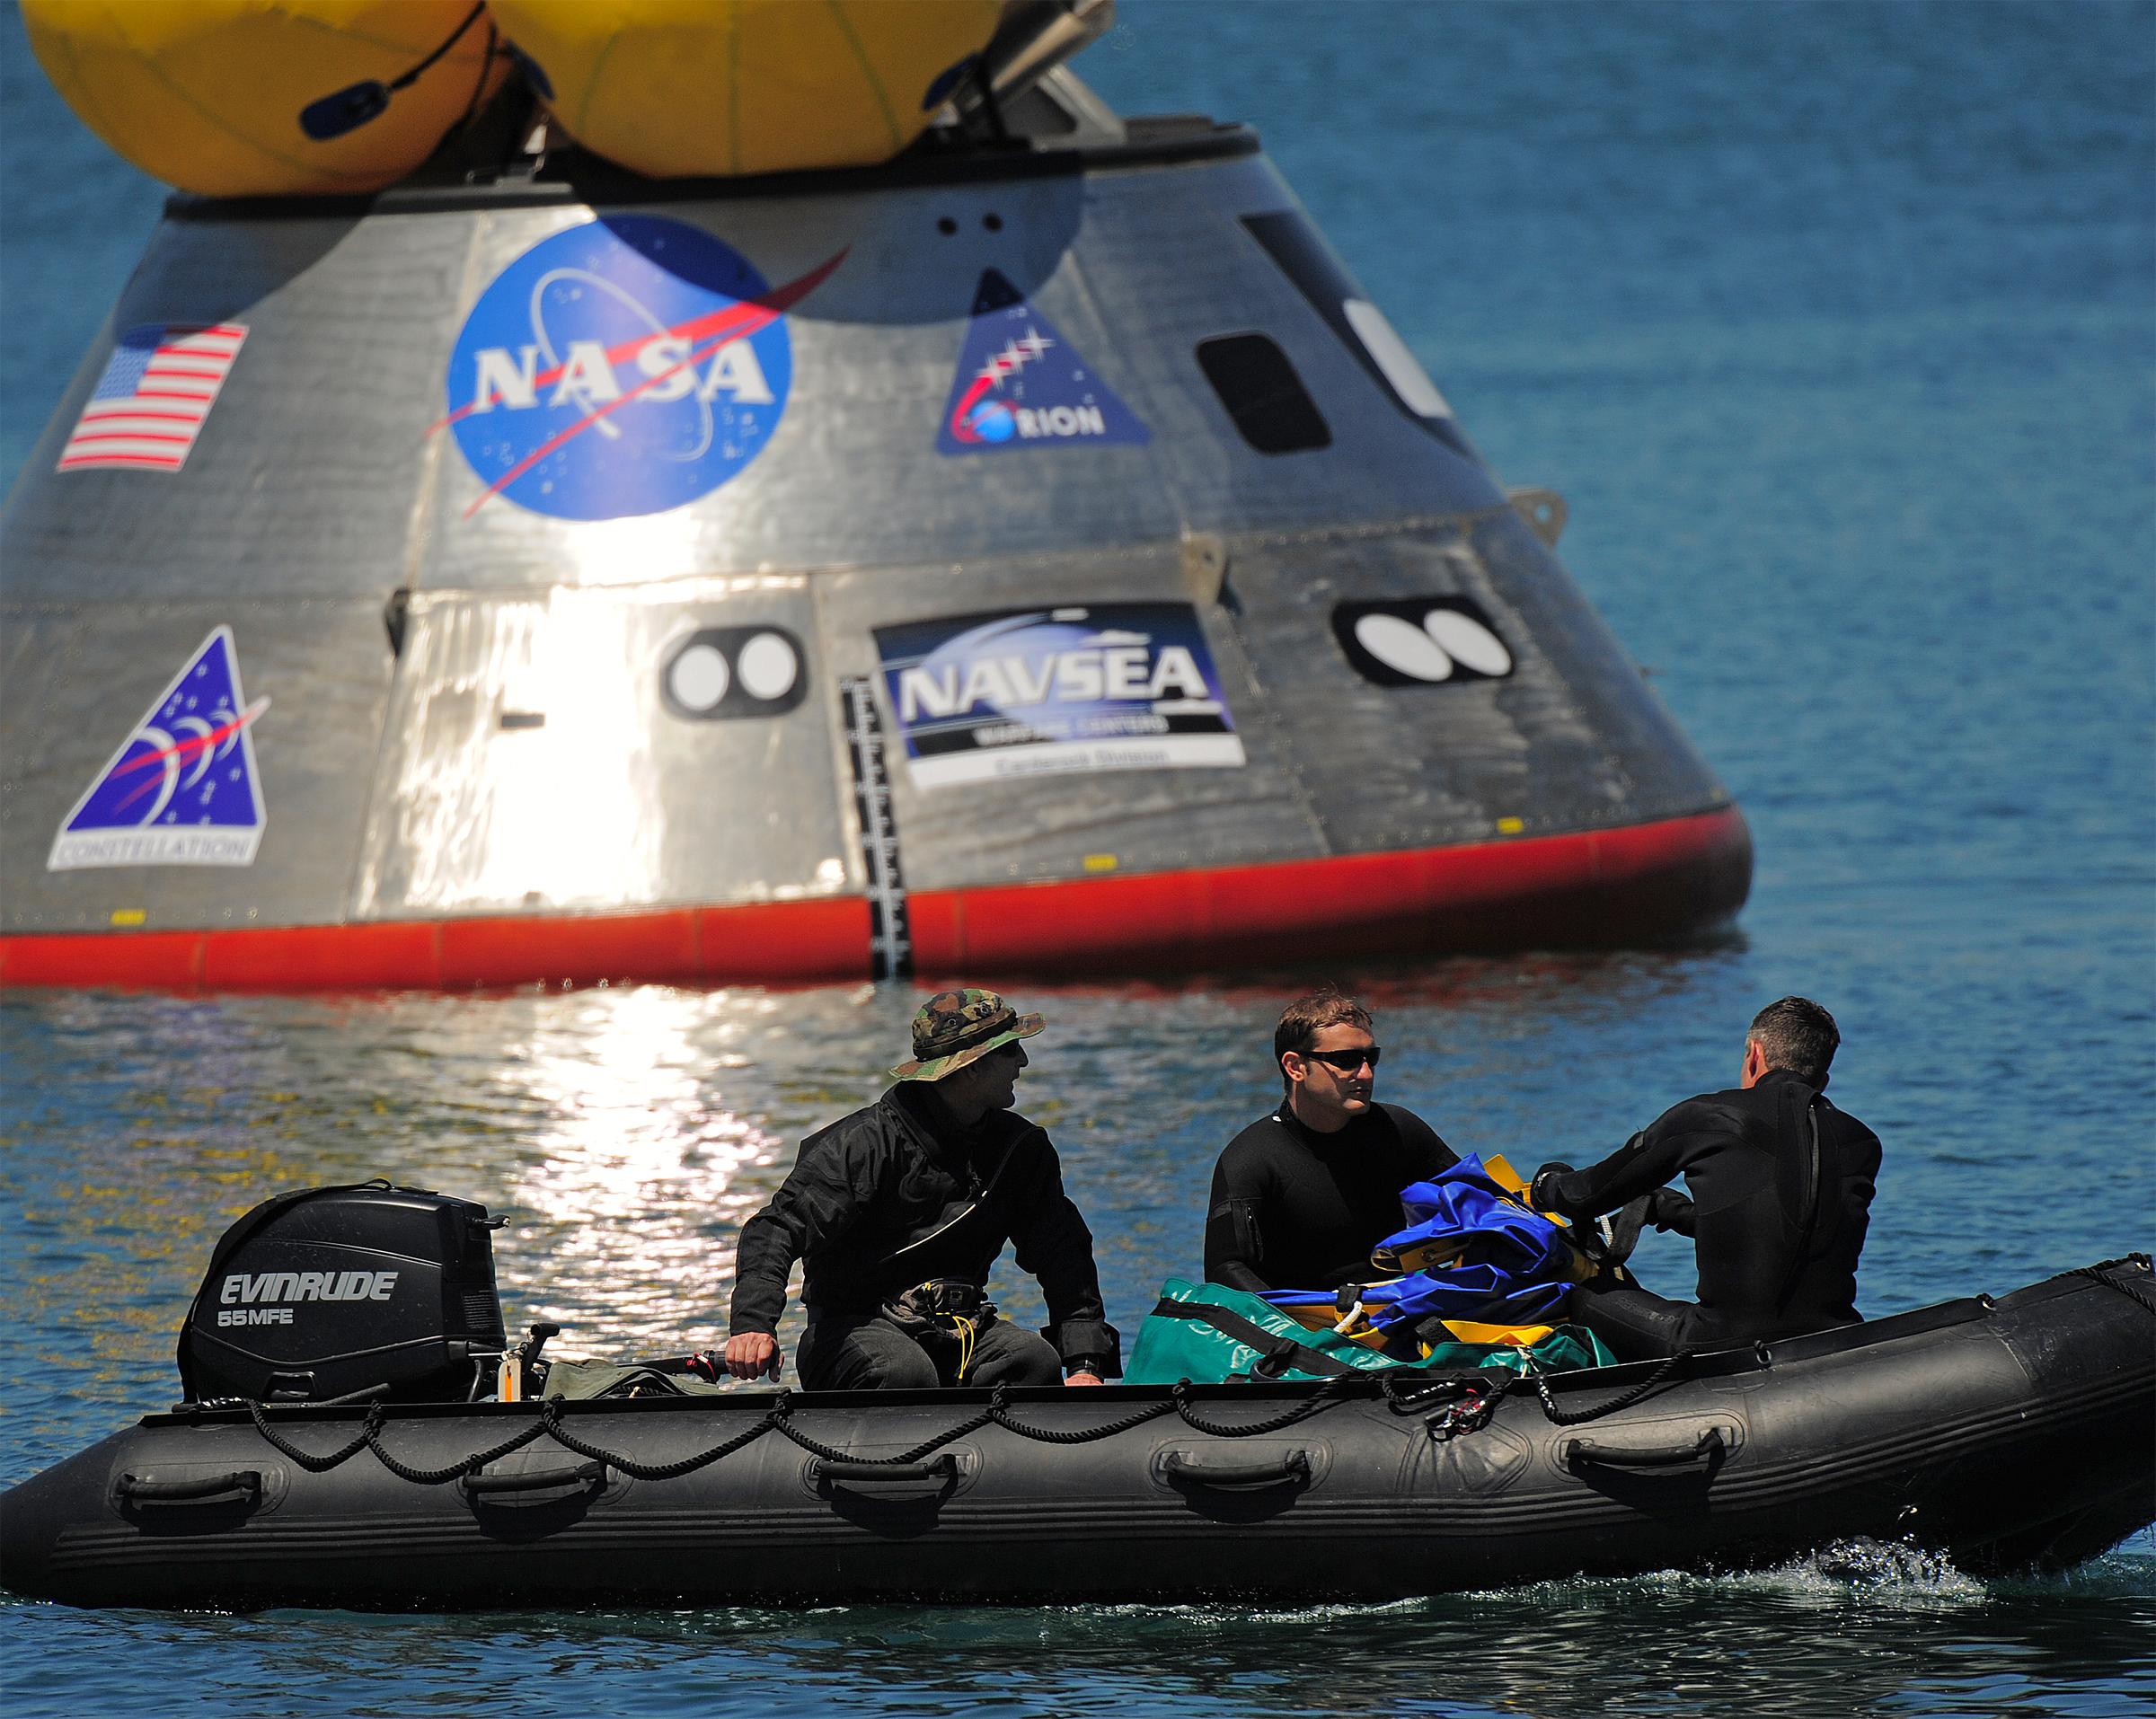 space shuttle rescue team - photo #39